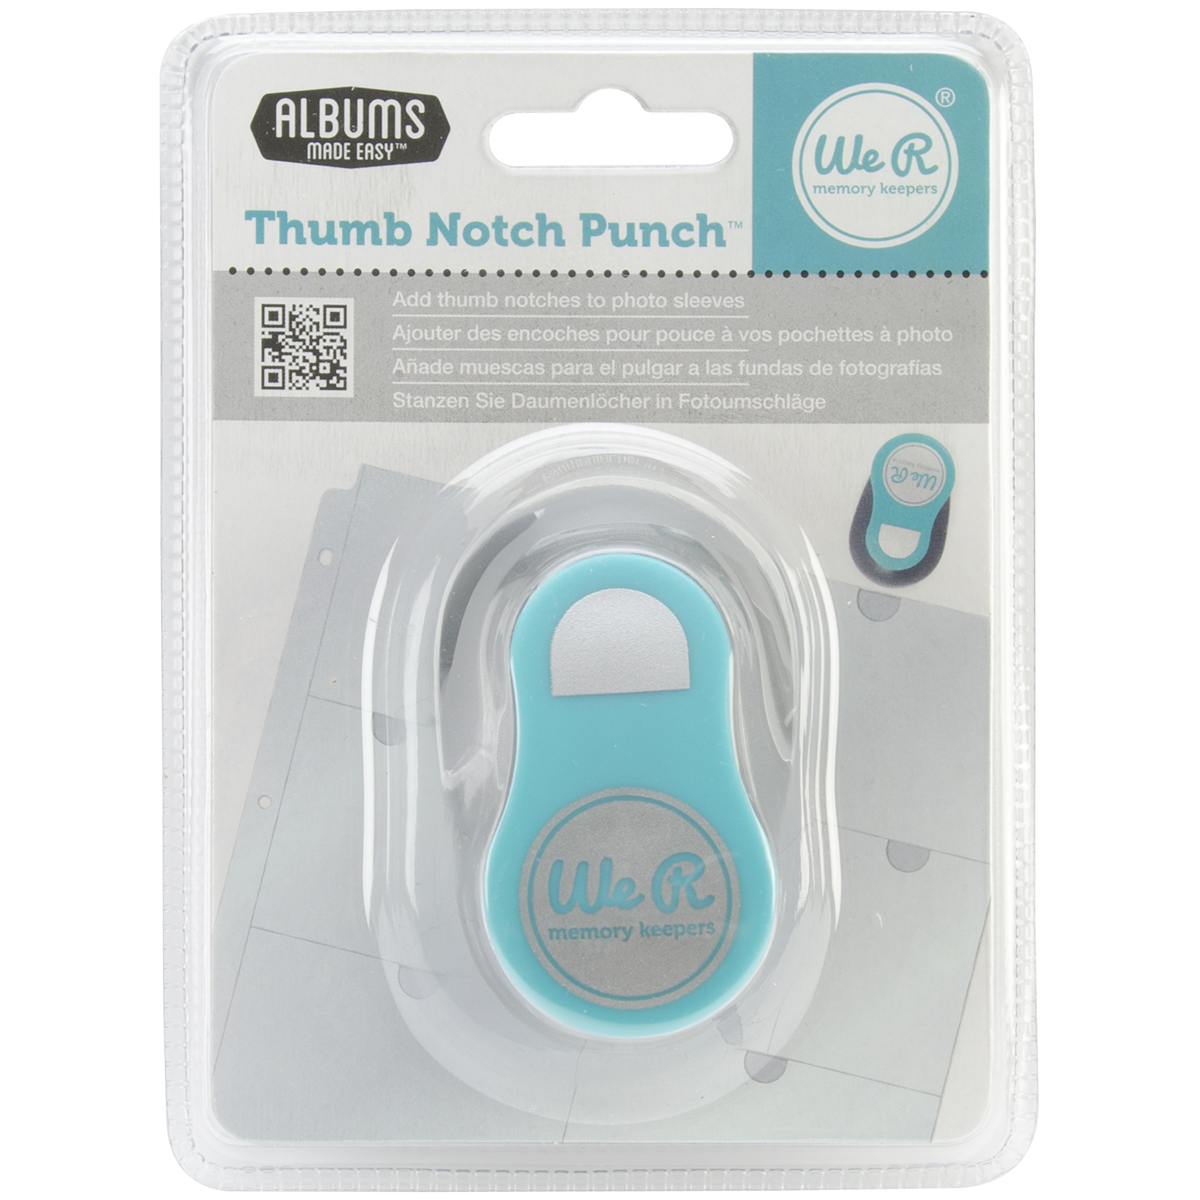 Thumb Notch Punch